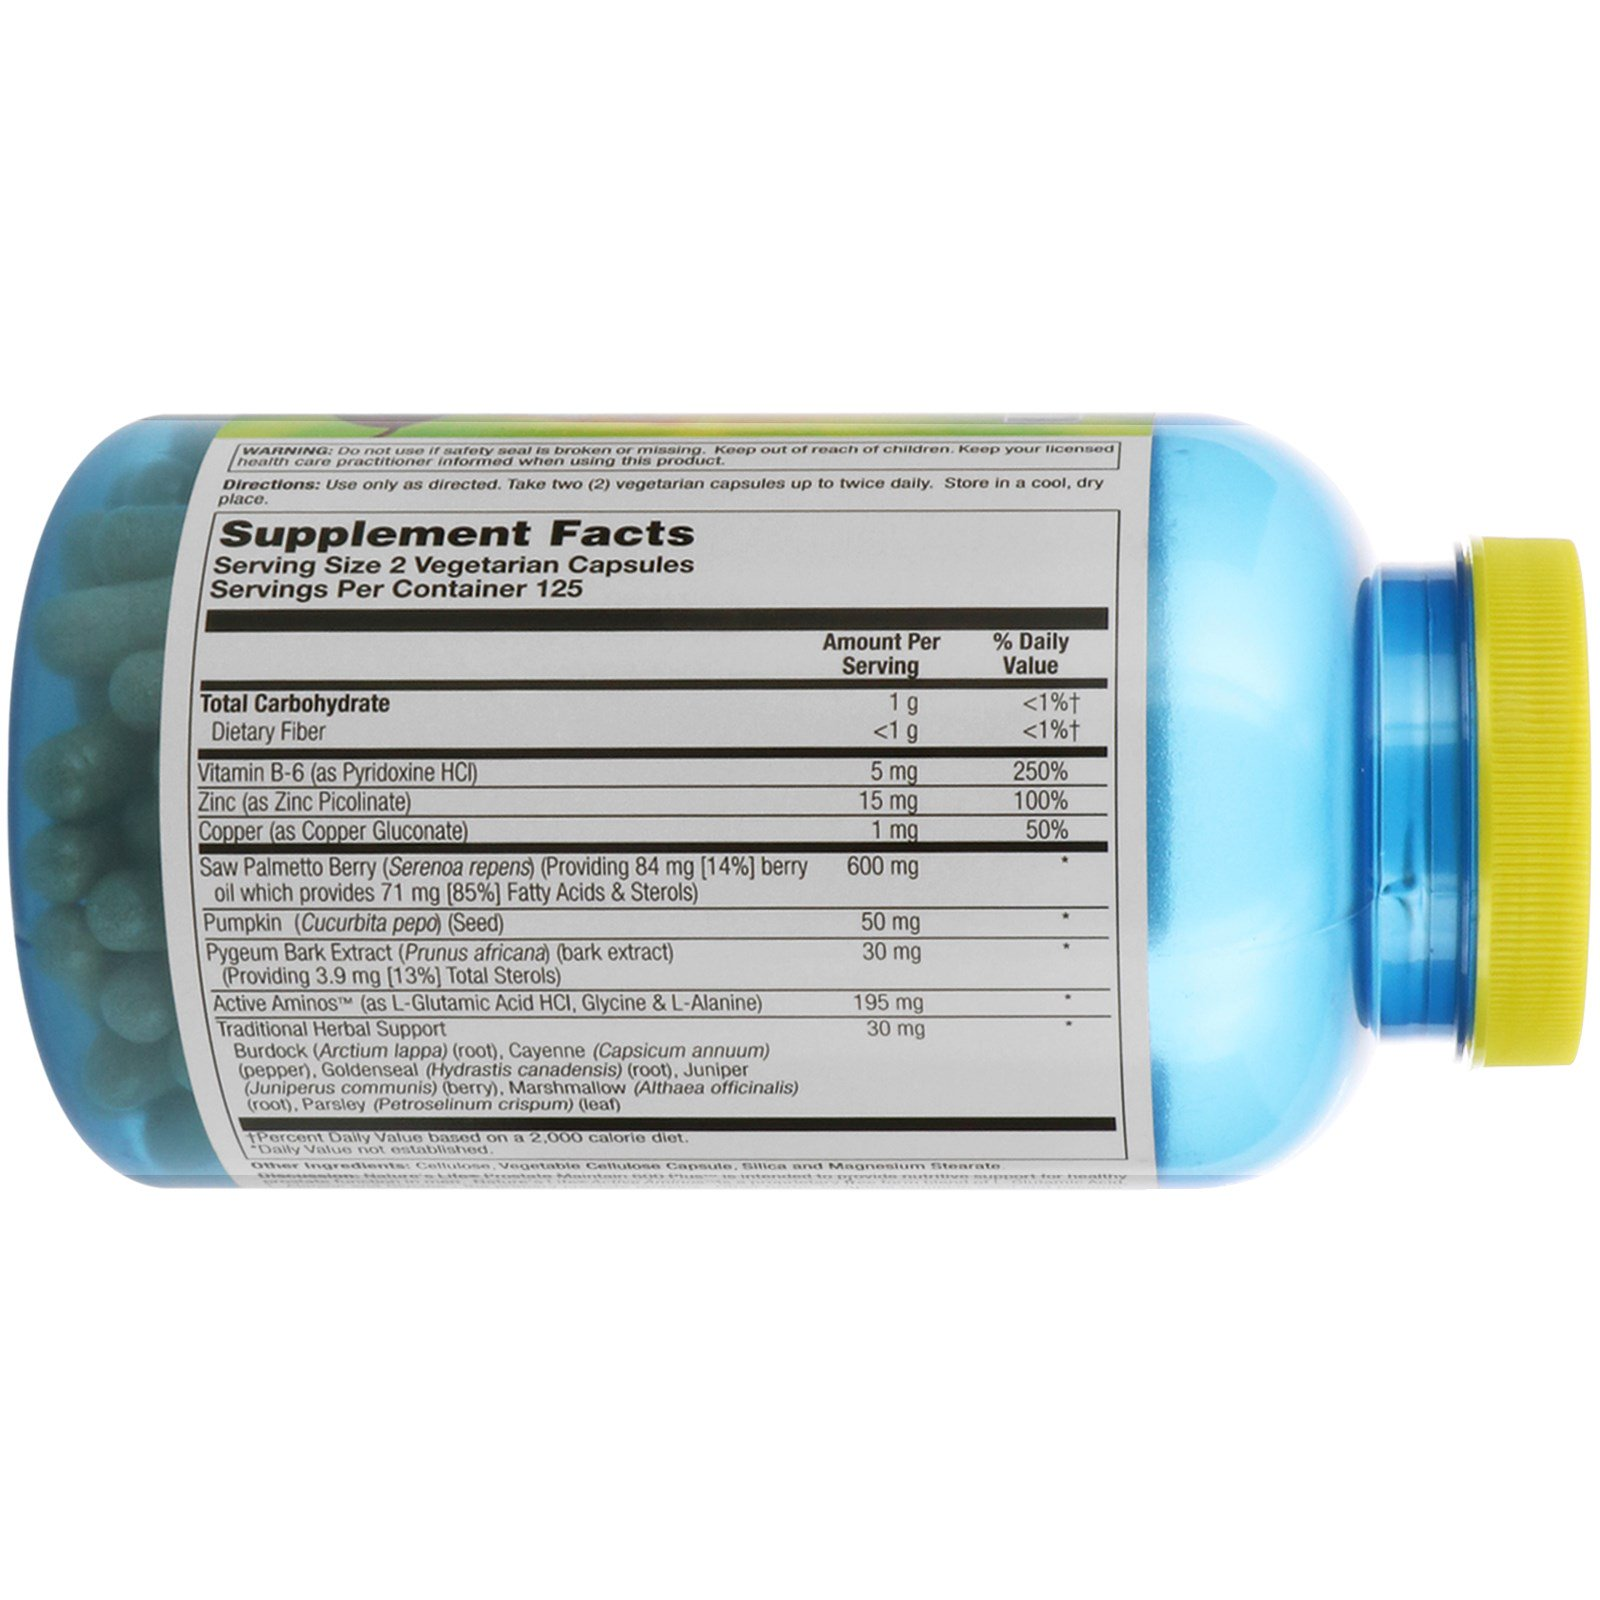 pigenil africano 50 mg prostata acquisto online free